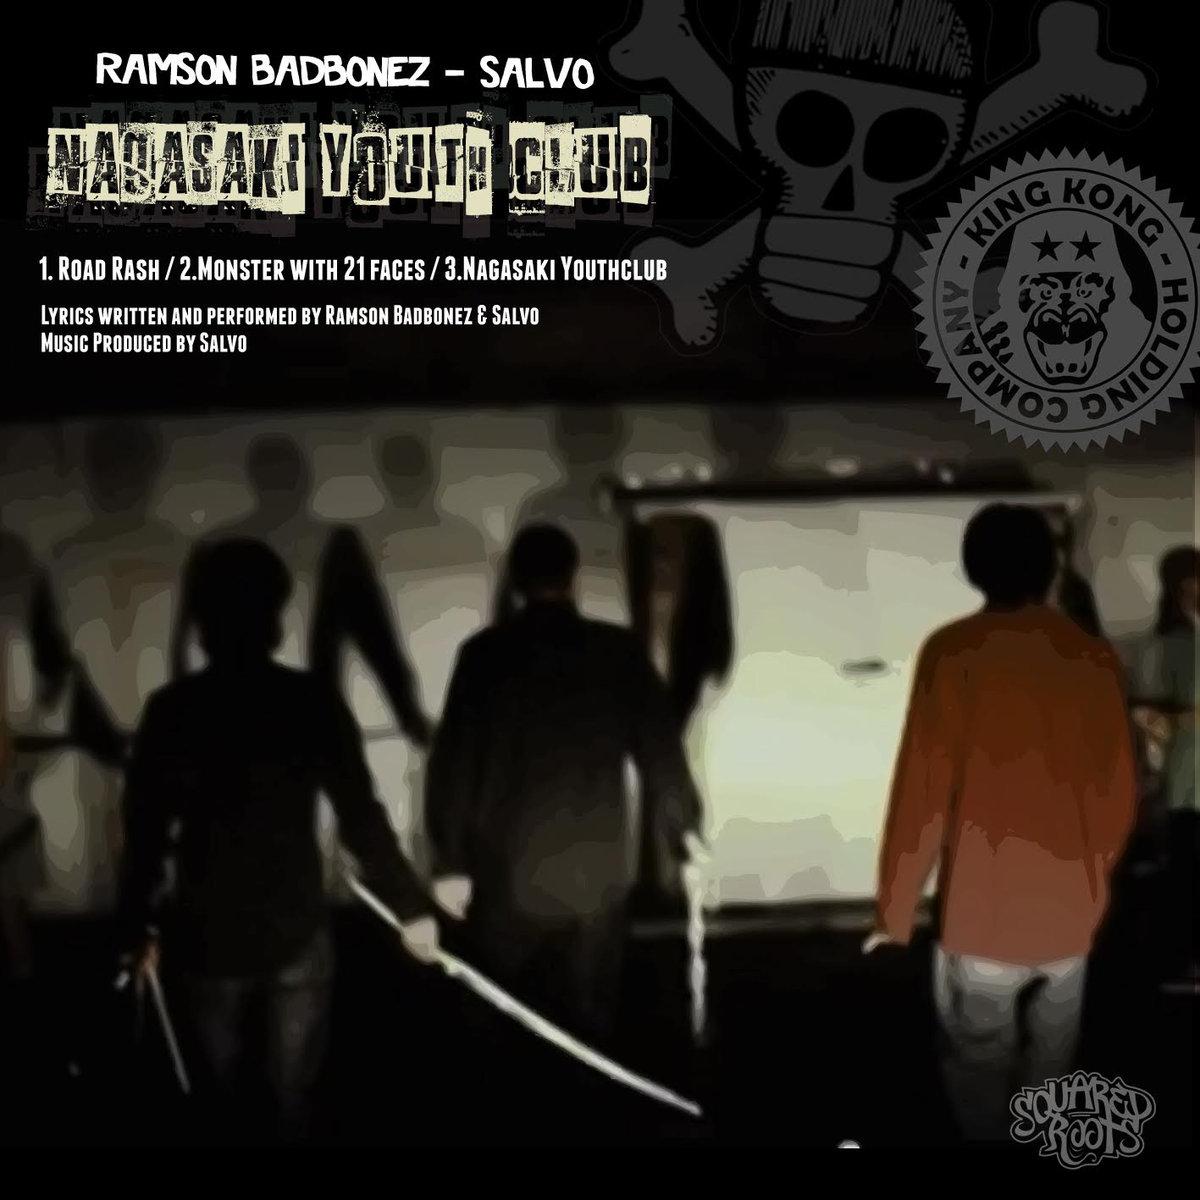 Ramson Badbonez - Nagasaki Youth Club